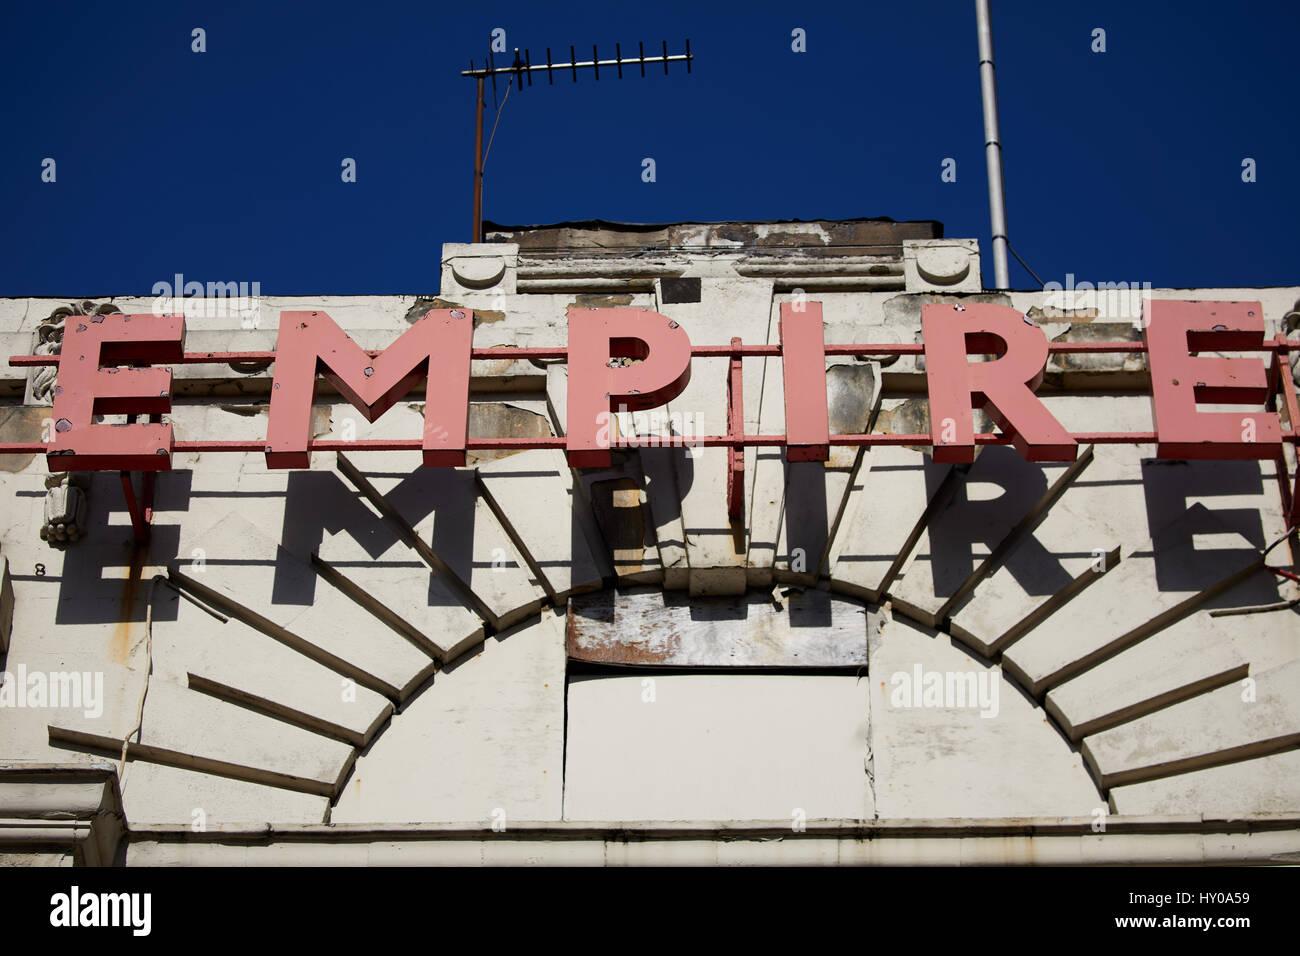 Empire secondhand shop Huddersfield town centre a large market town metropolitan borough  Kirklees, tWest Yorkshire, - Stock Image